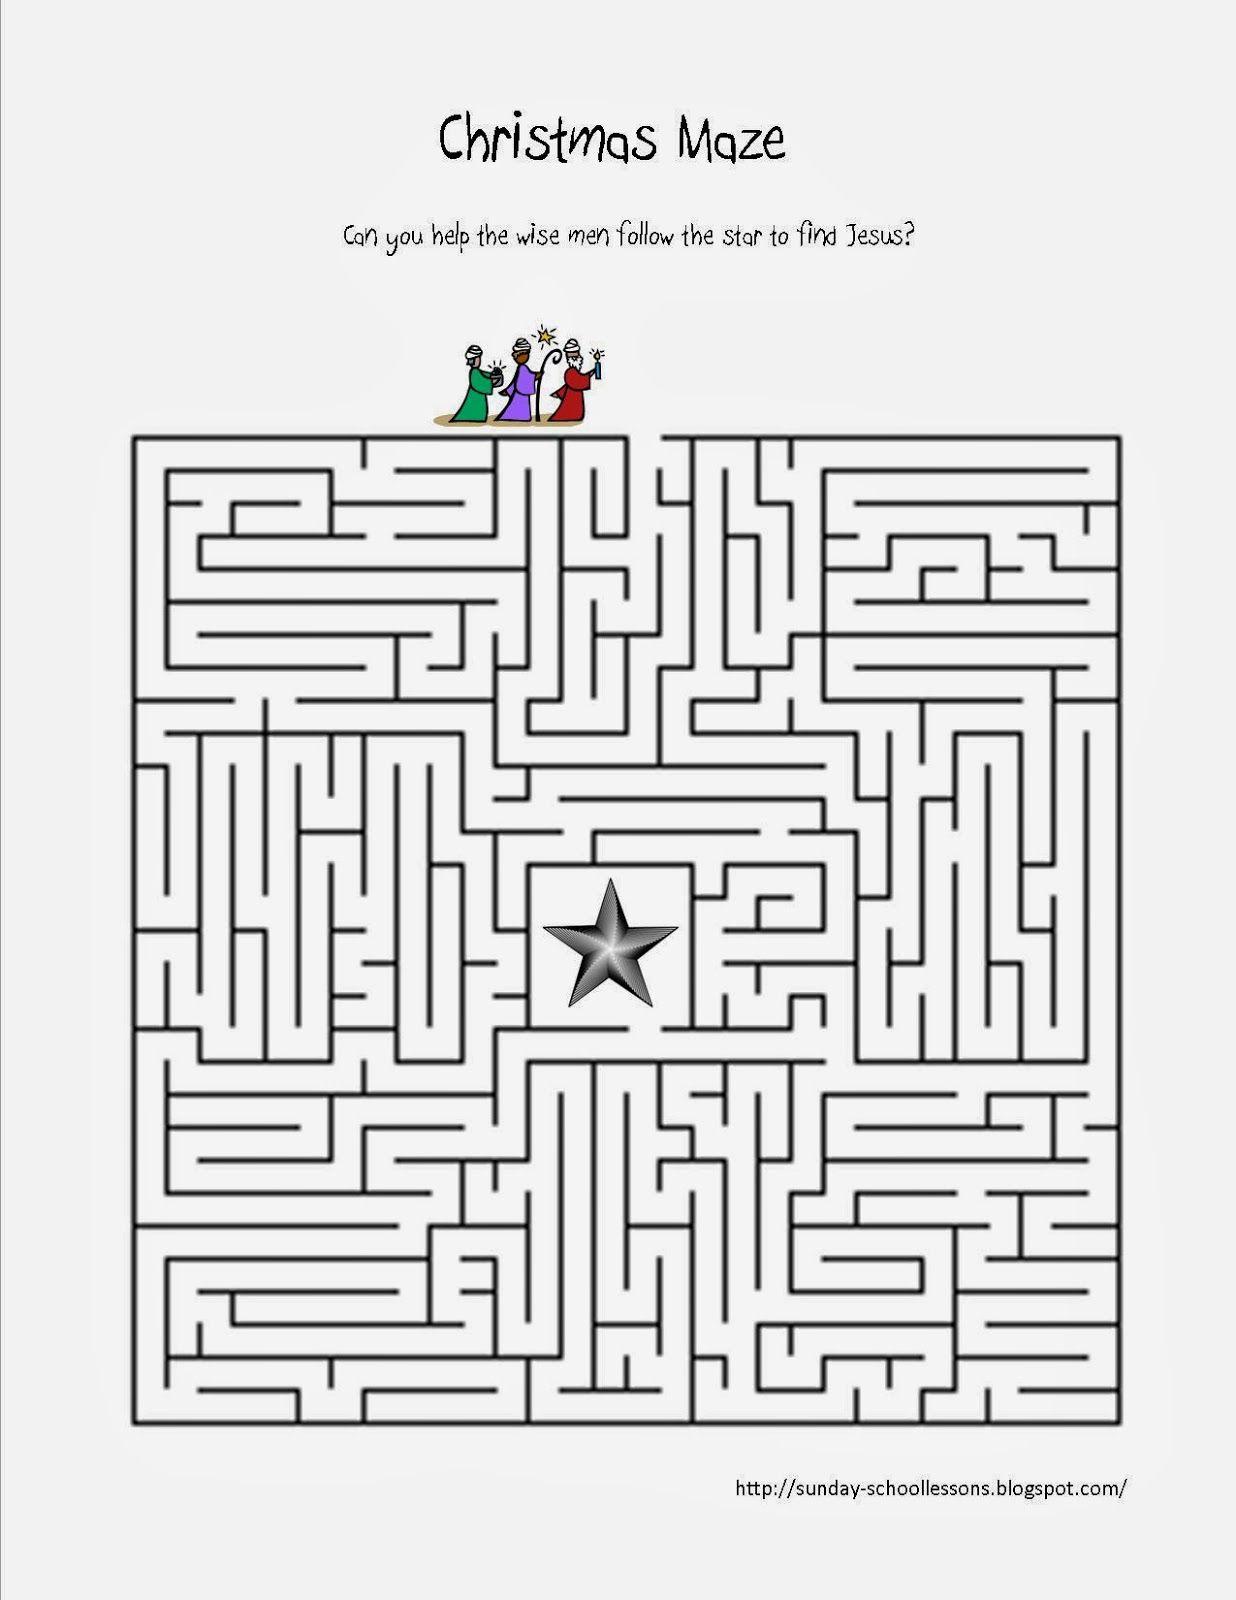 Wise Men Find Jesus Maze | Christmas Sunday School Lessons